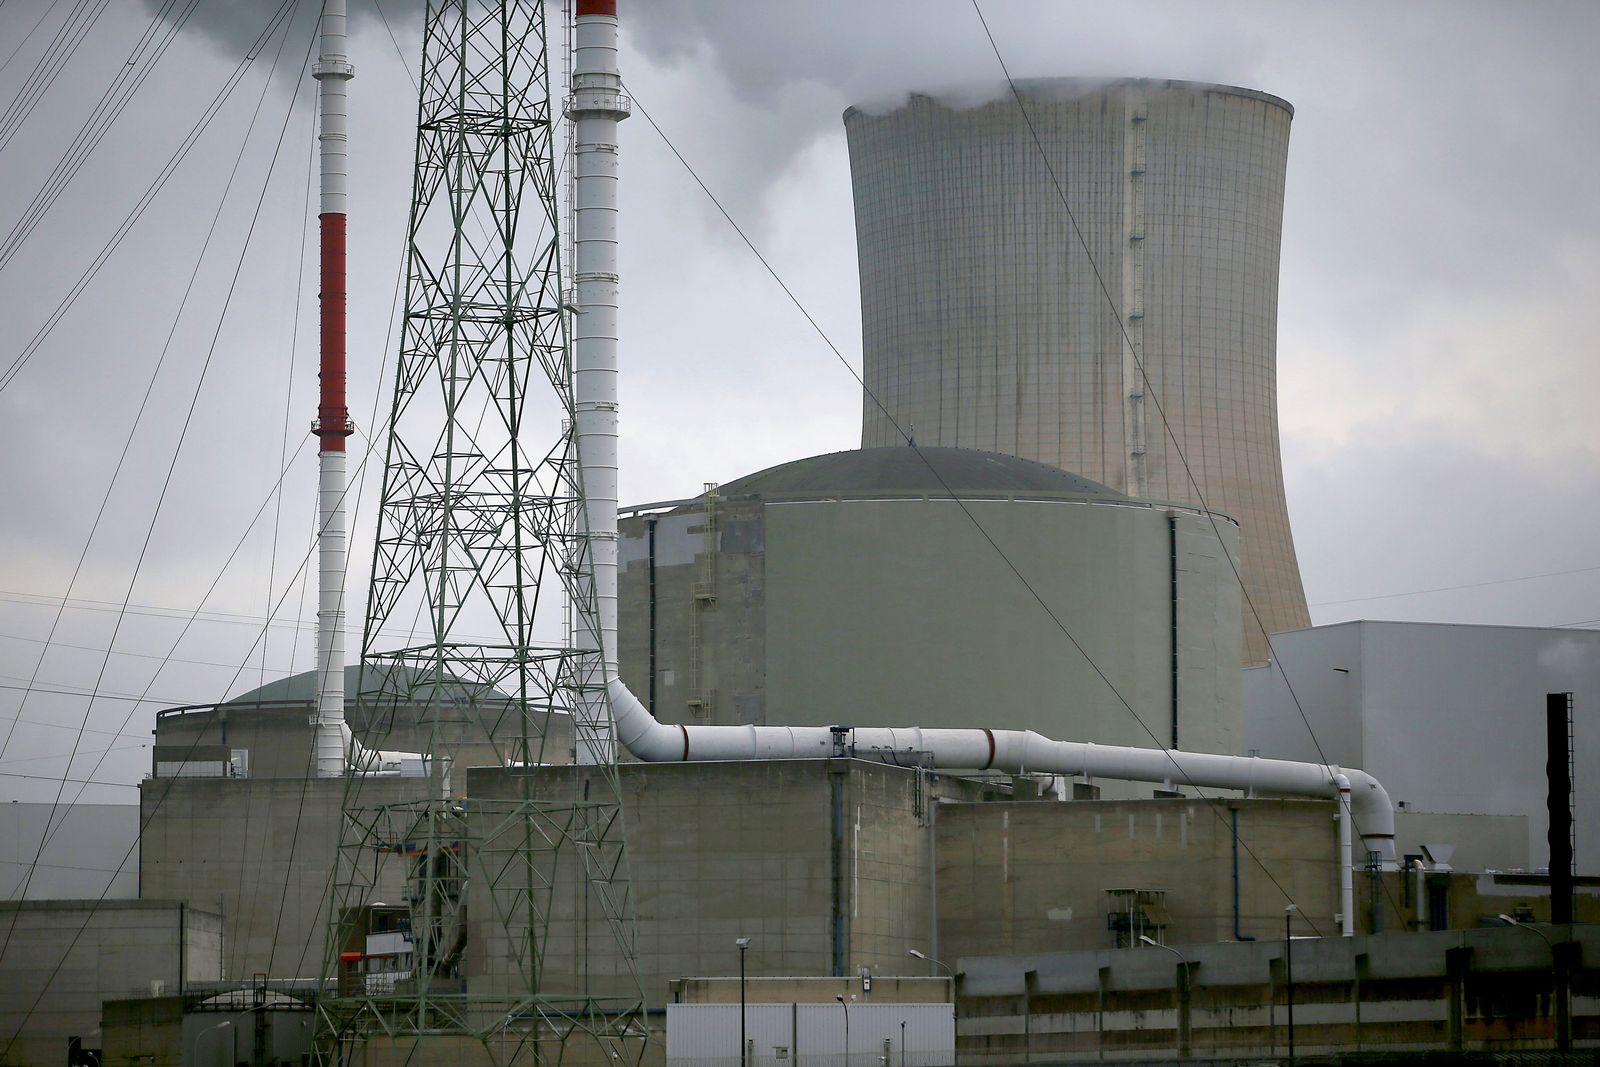 Atomkraftwerk Tihange Belgien